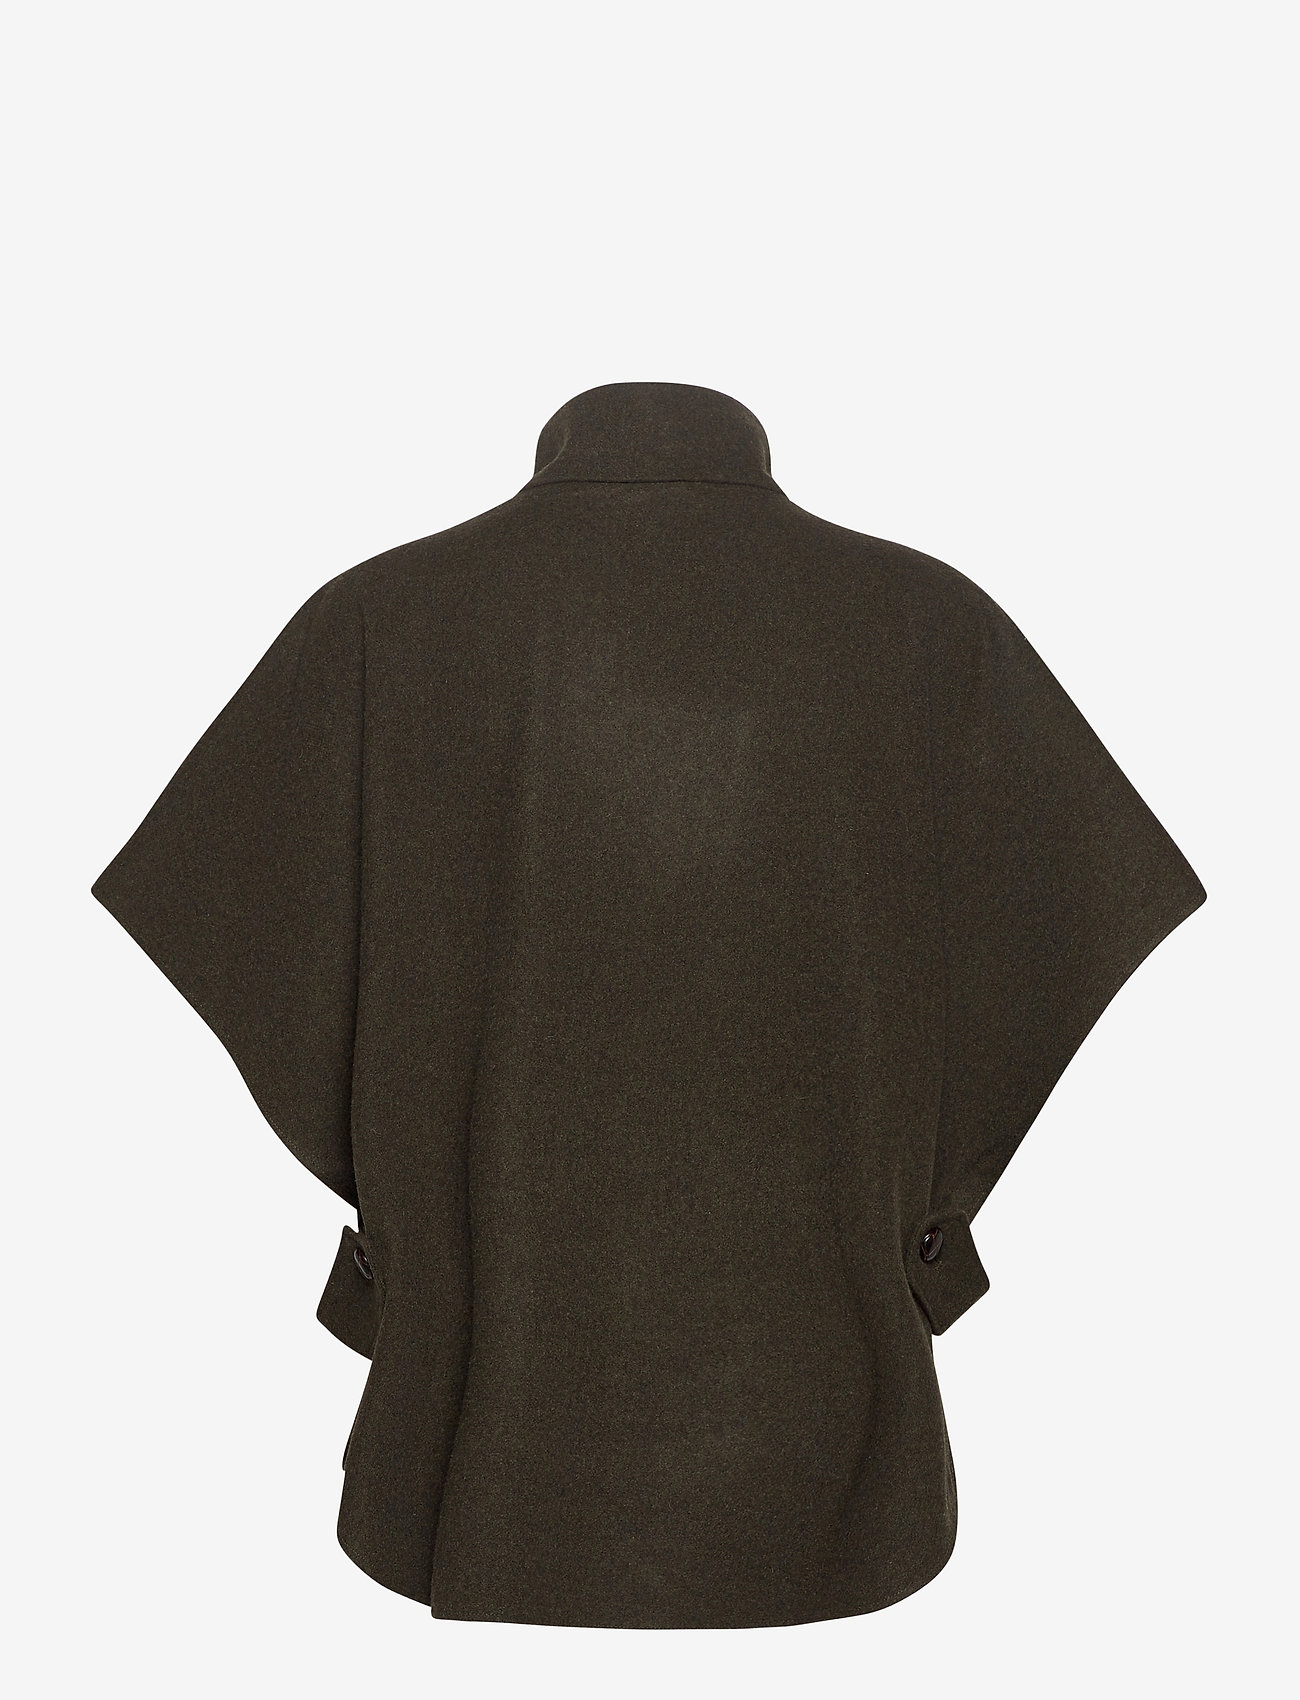 Six Ames - KAPPA - wool jackets - green melange - 1